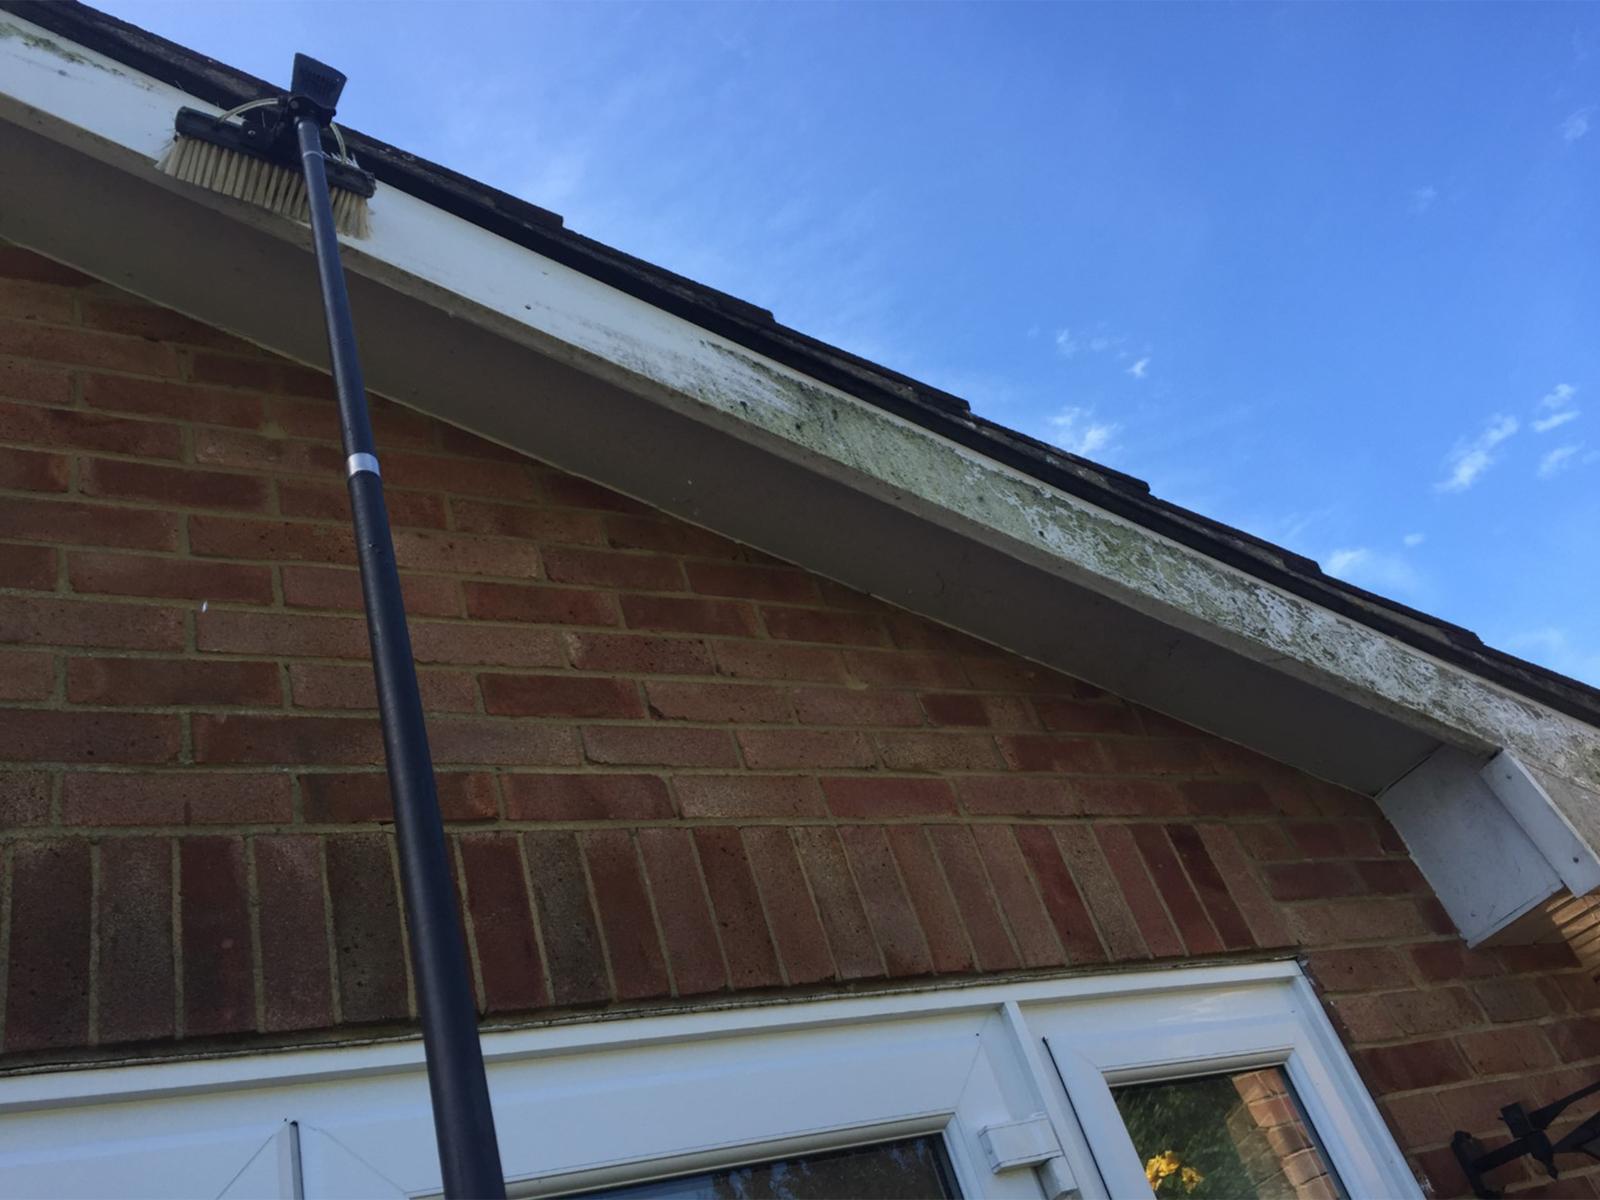 gutter fascia-soffit-cleaning-tring berkhamsted.jpg